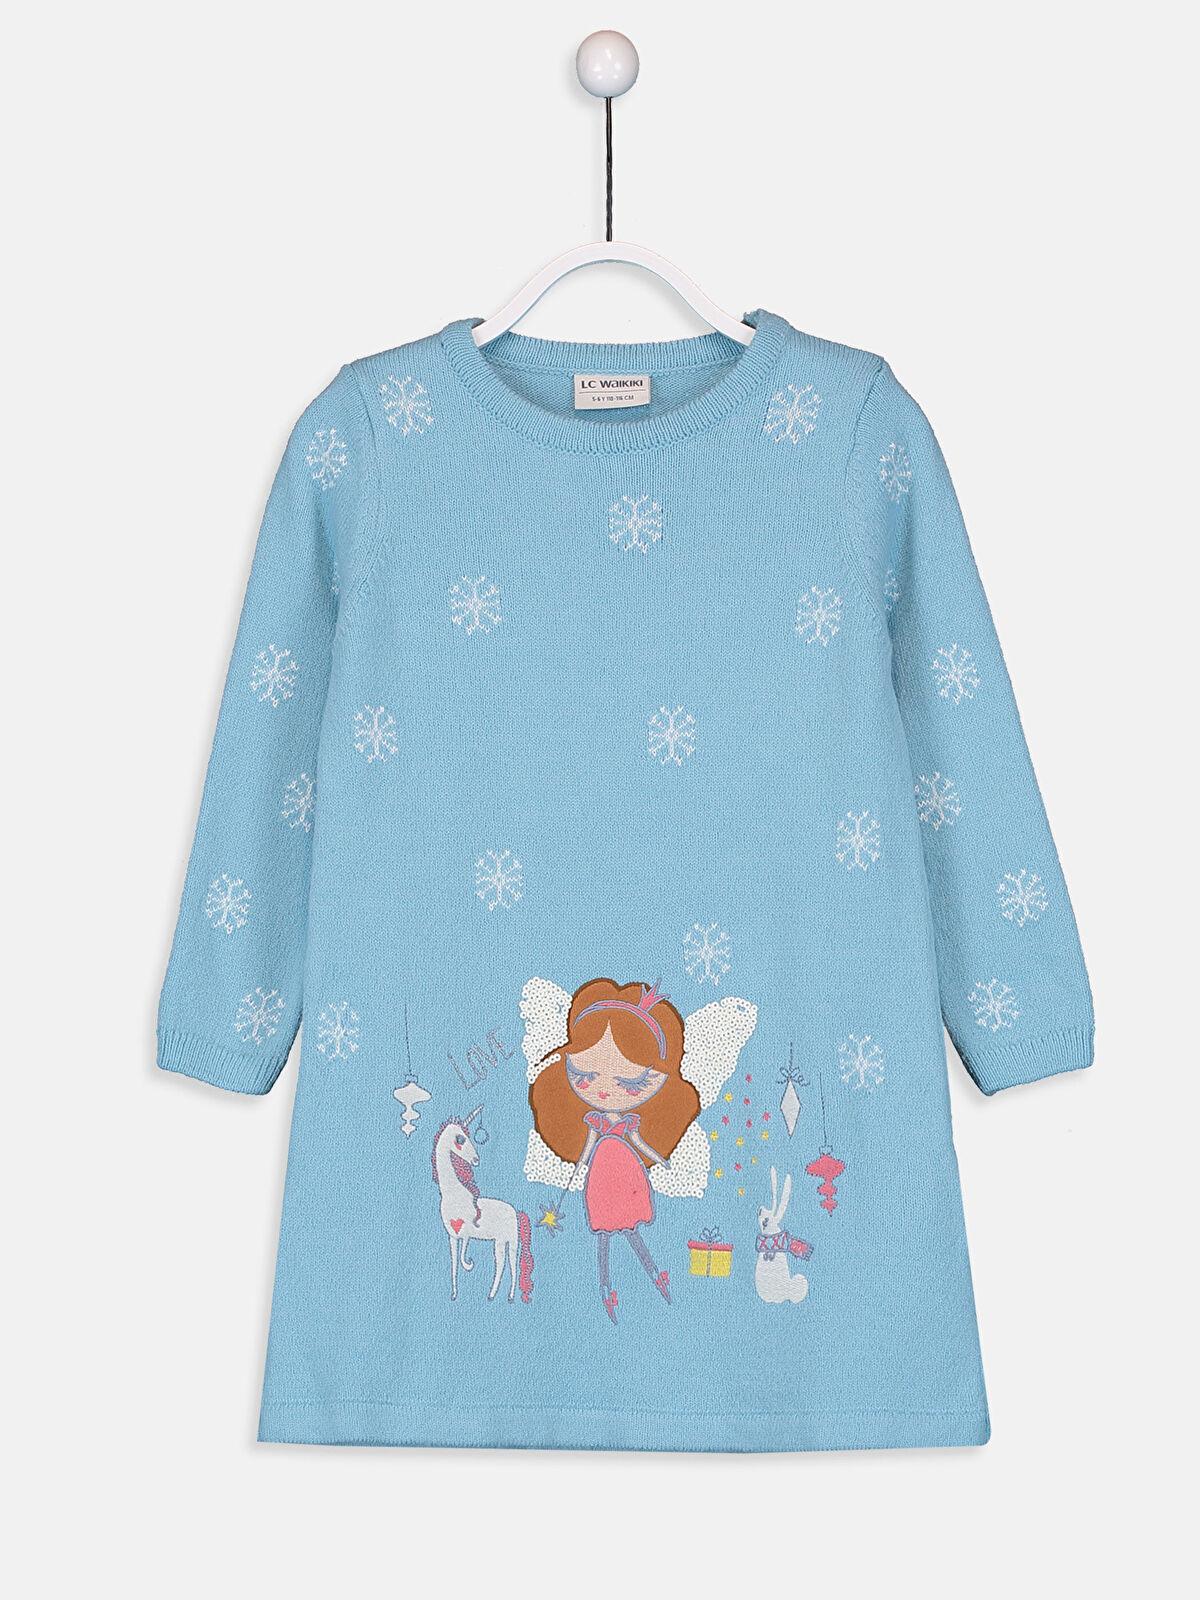 Kız Çocuk Desenli Triko Elbise - LC WAIKIKI